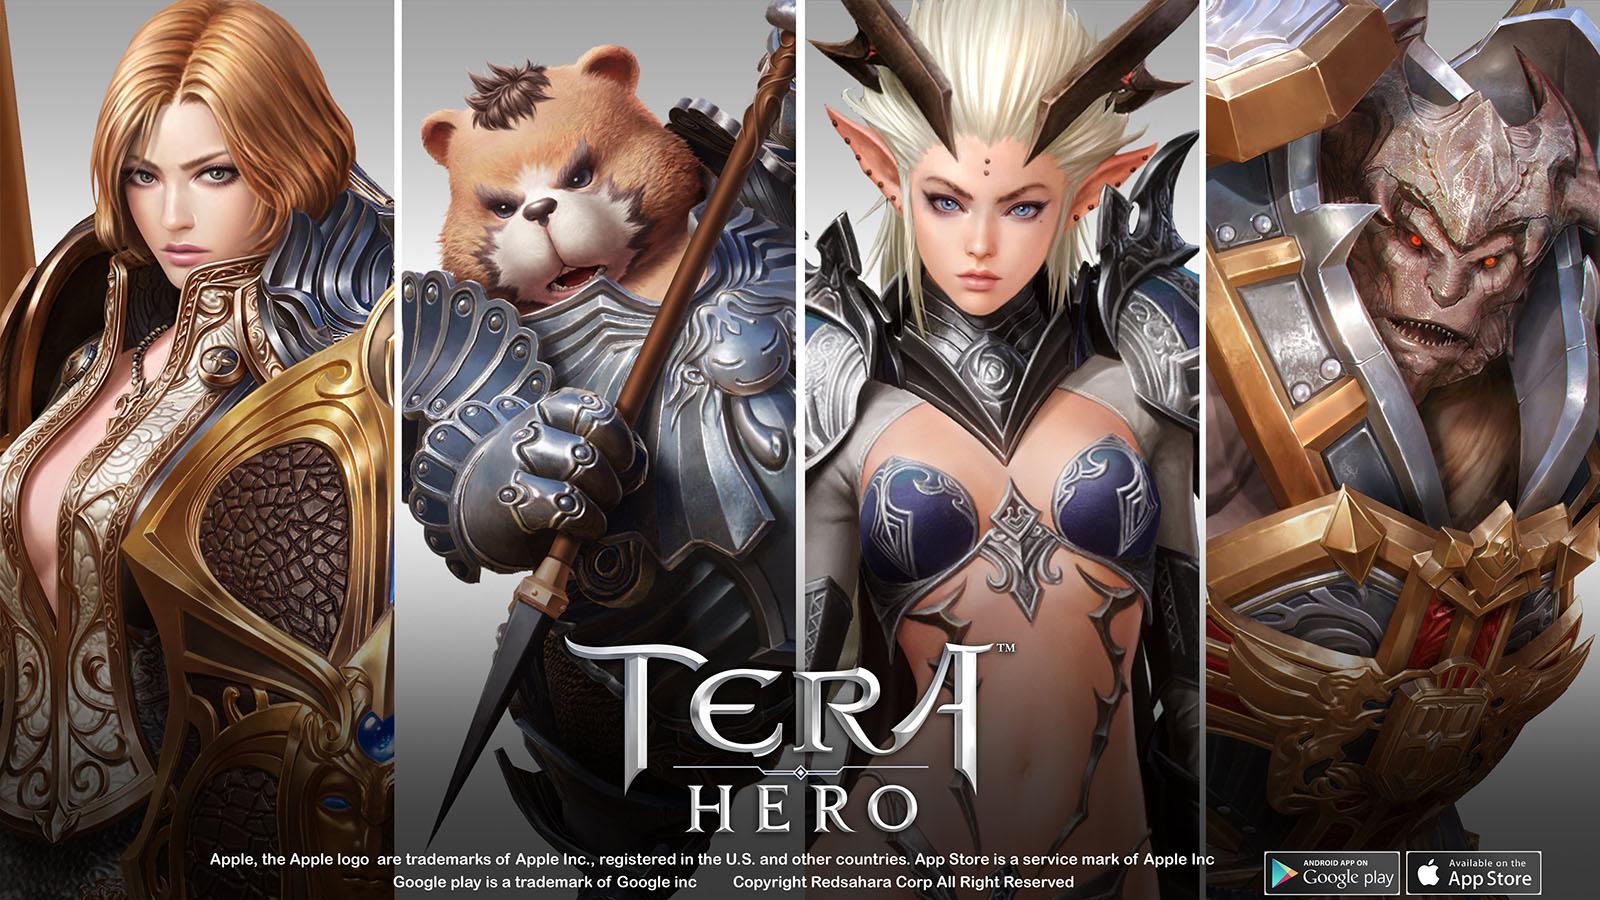 Screenshot 2: Tera Hero